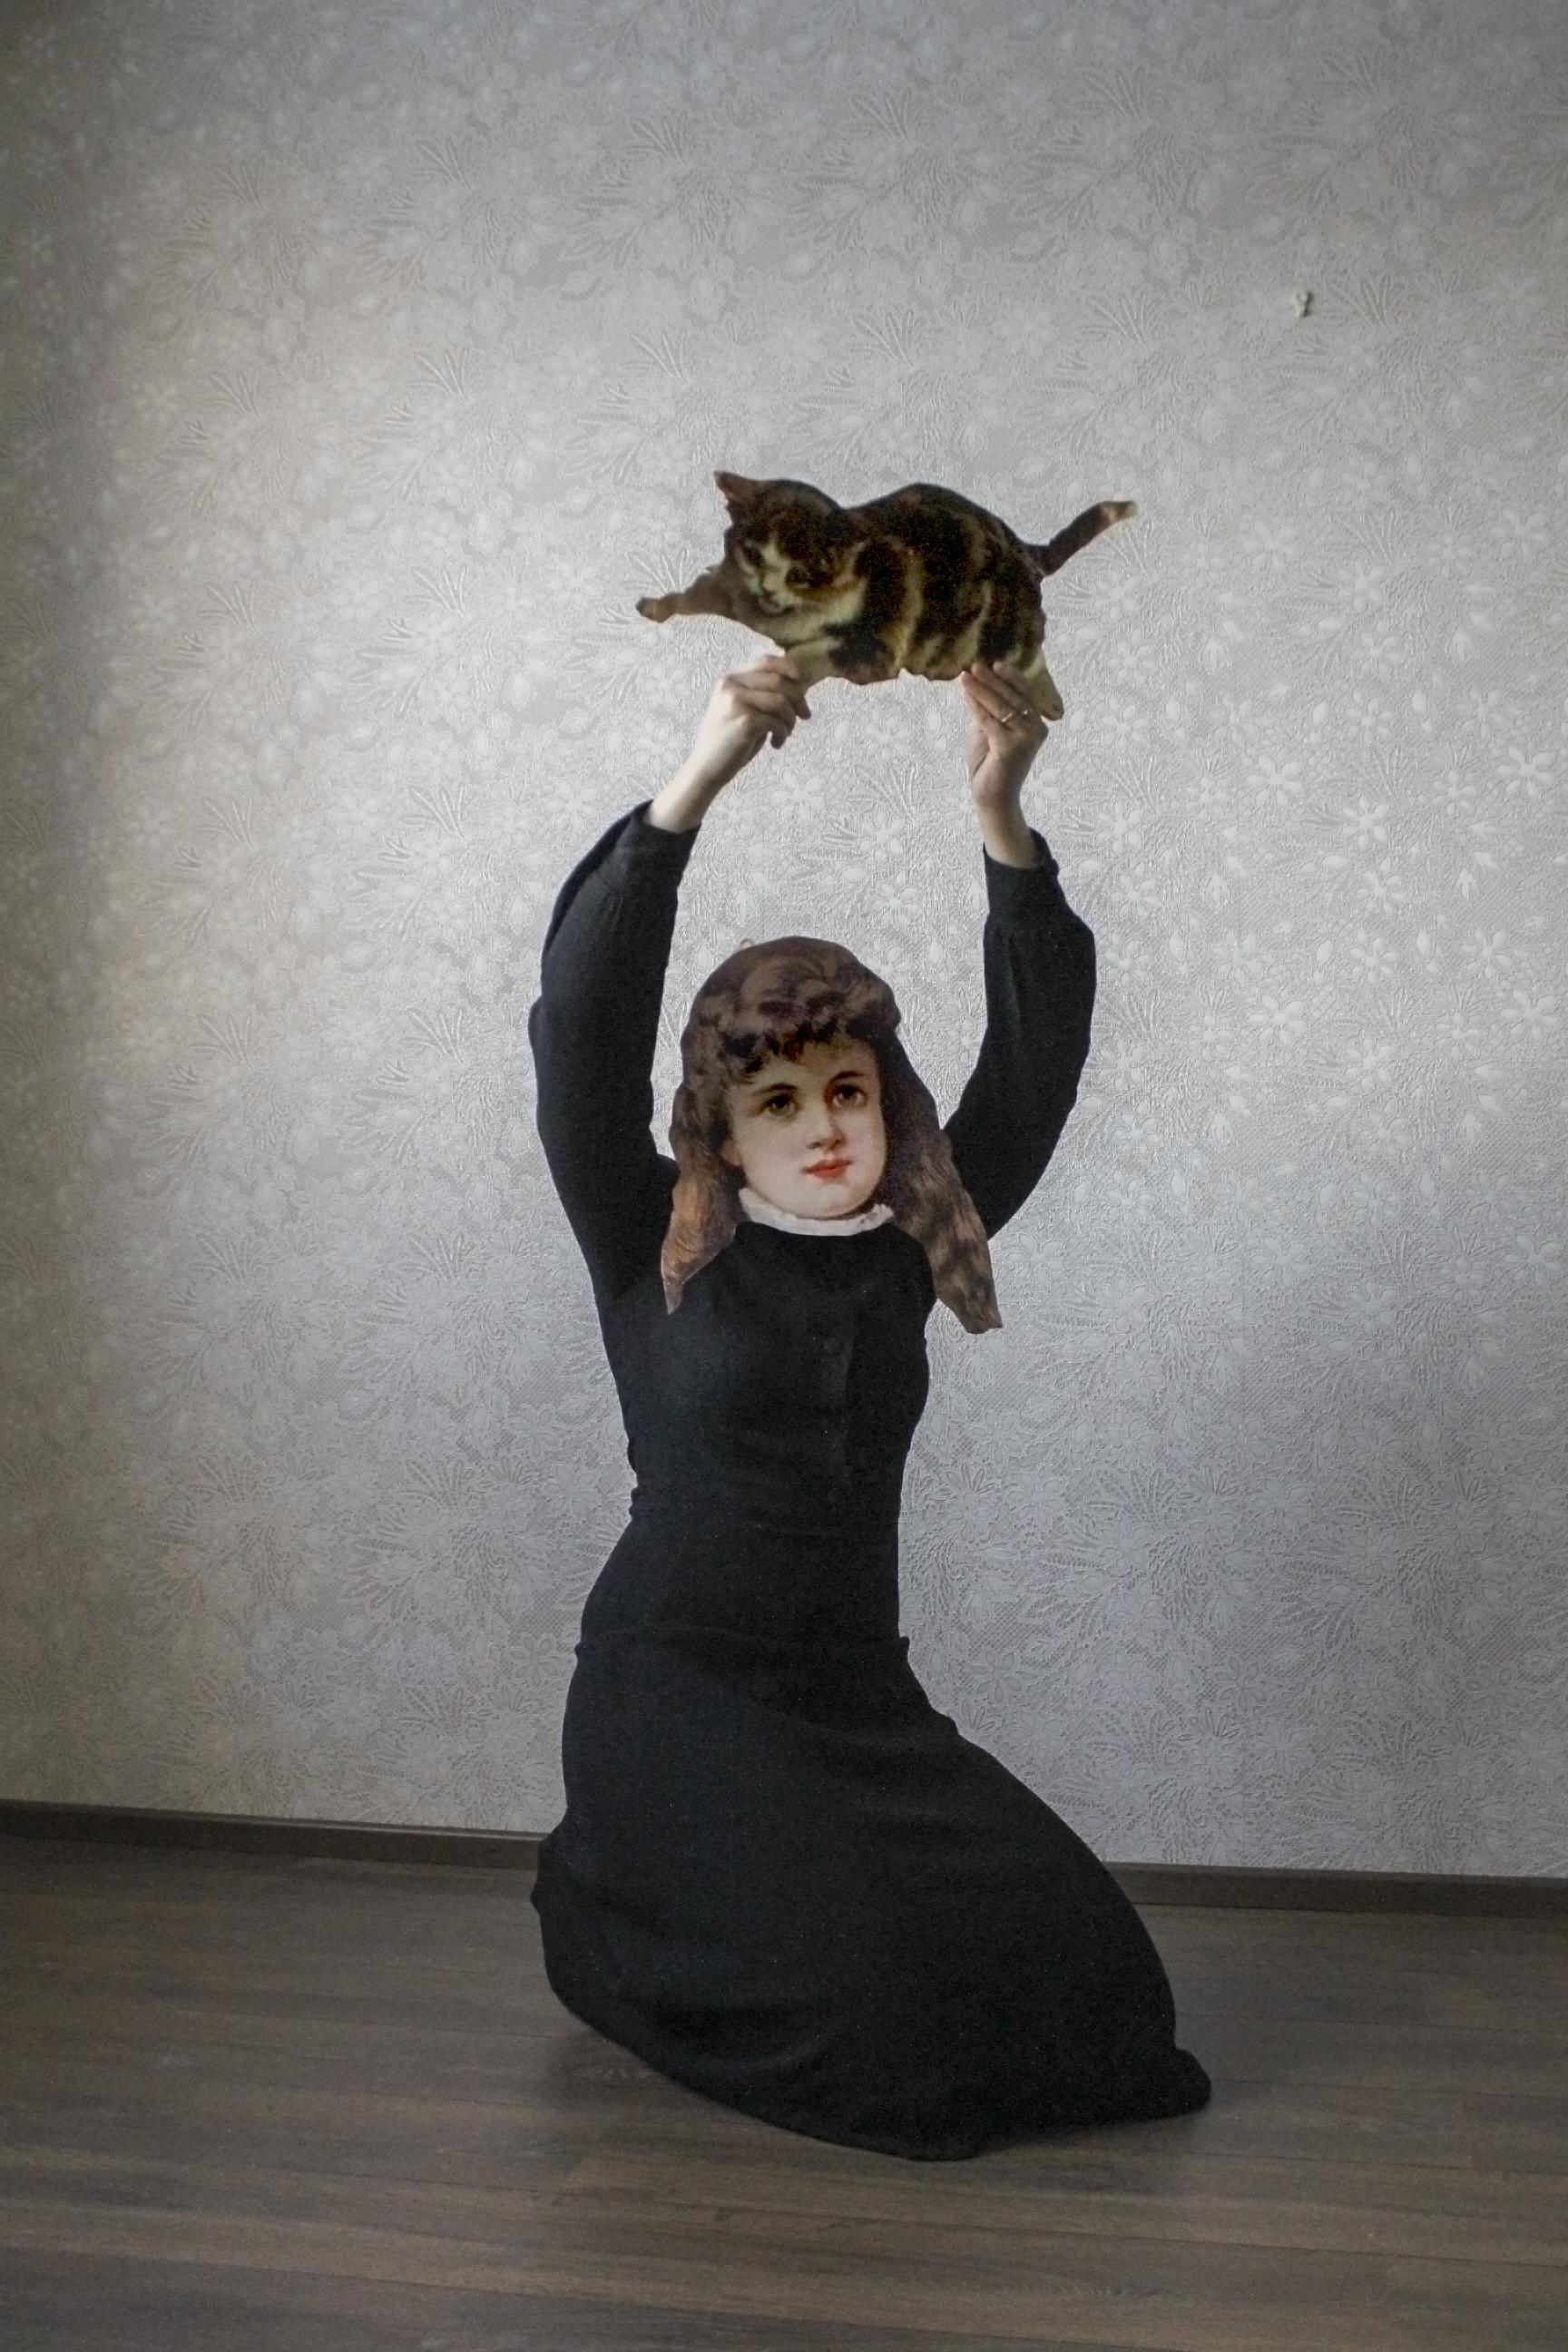 Cat People, 2015, 30 cm x 20 cm E.D 1/5